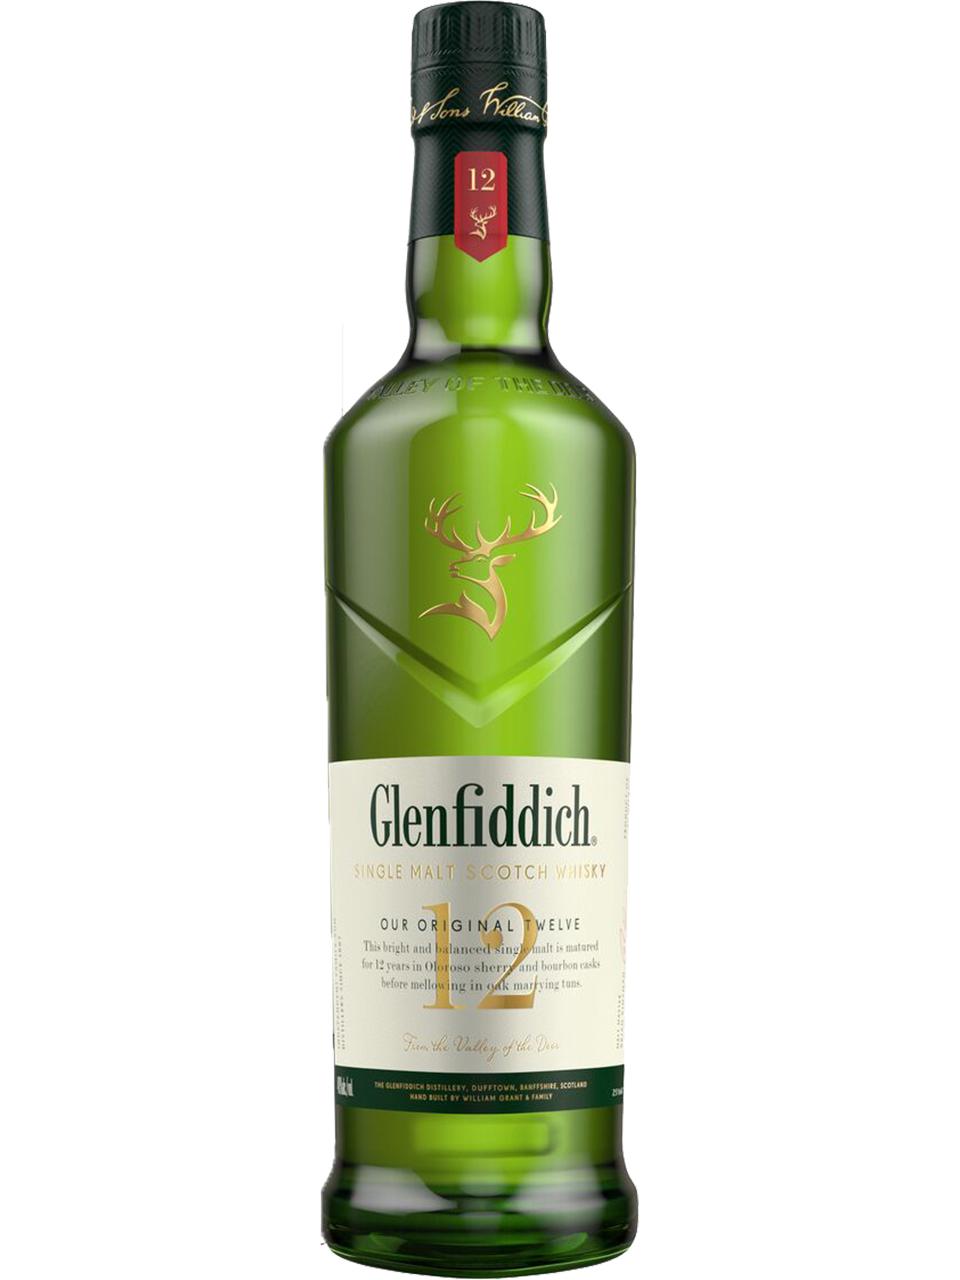 Glenfiddich Single Malt 12YO Scotch